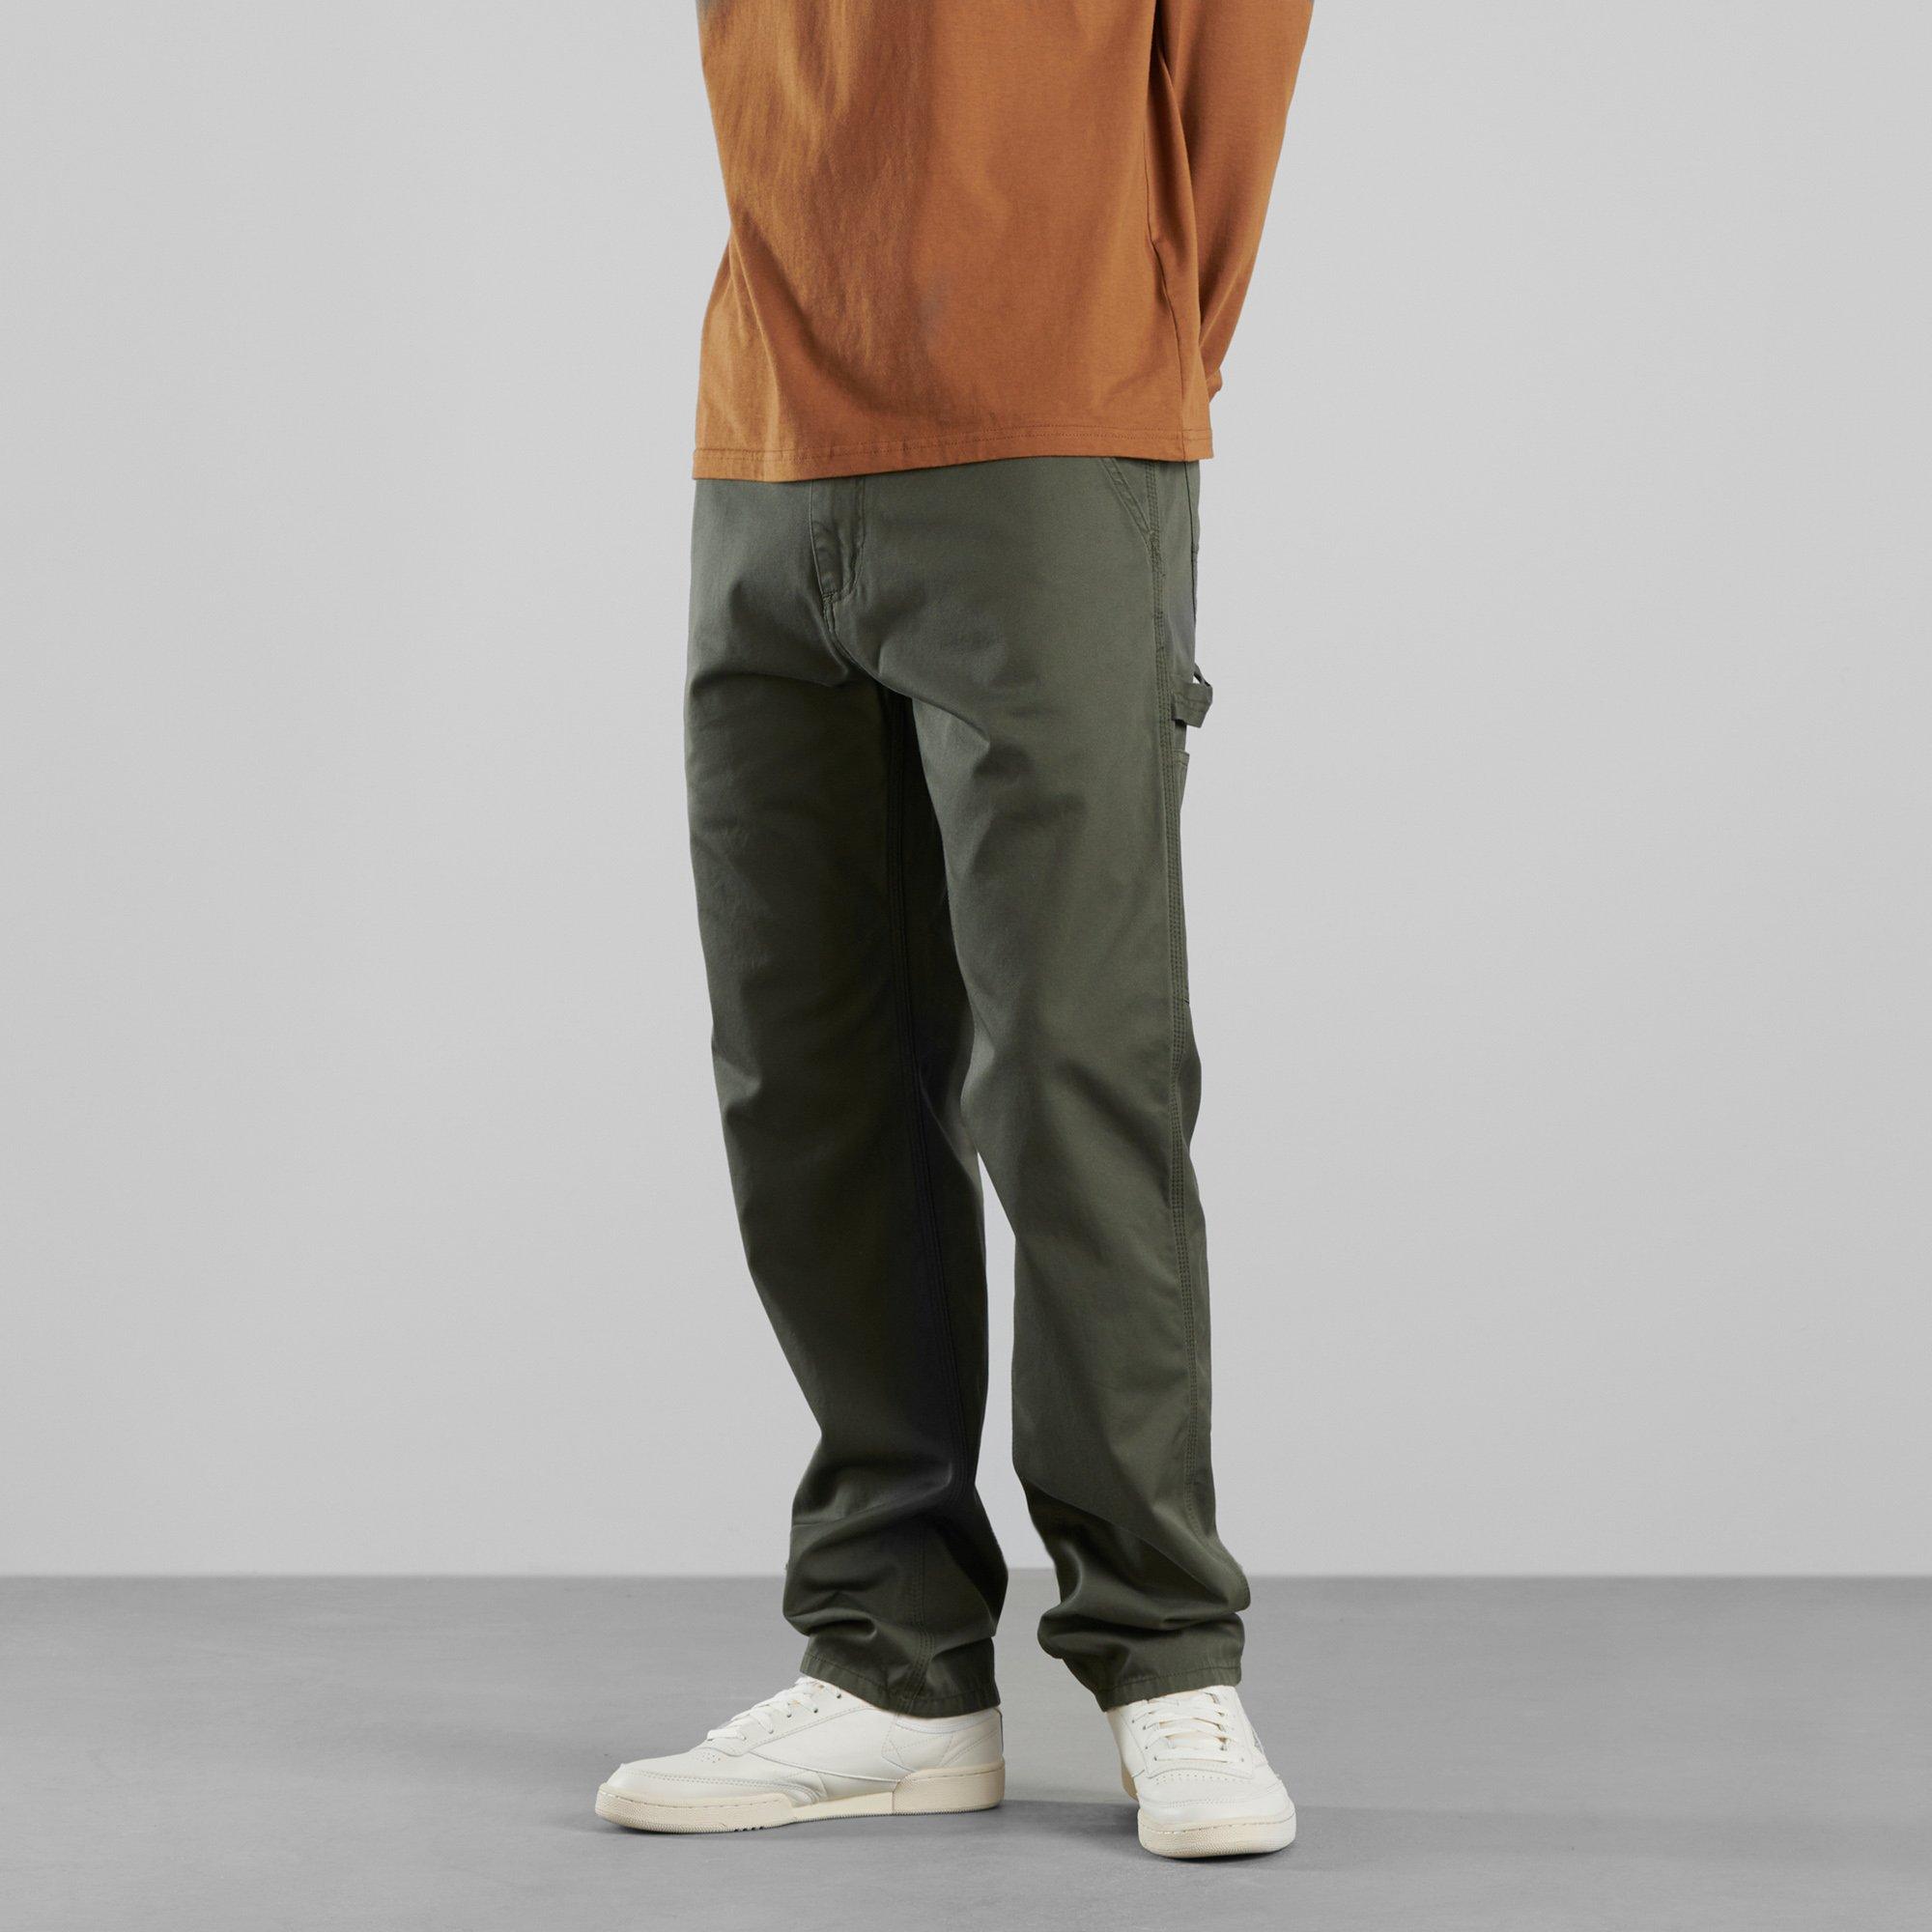 carhartt-ruck-single-knee-pants-cypress-1.jpg